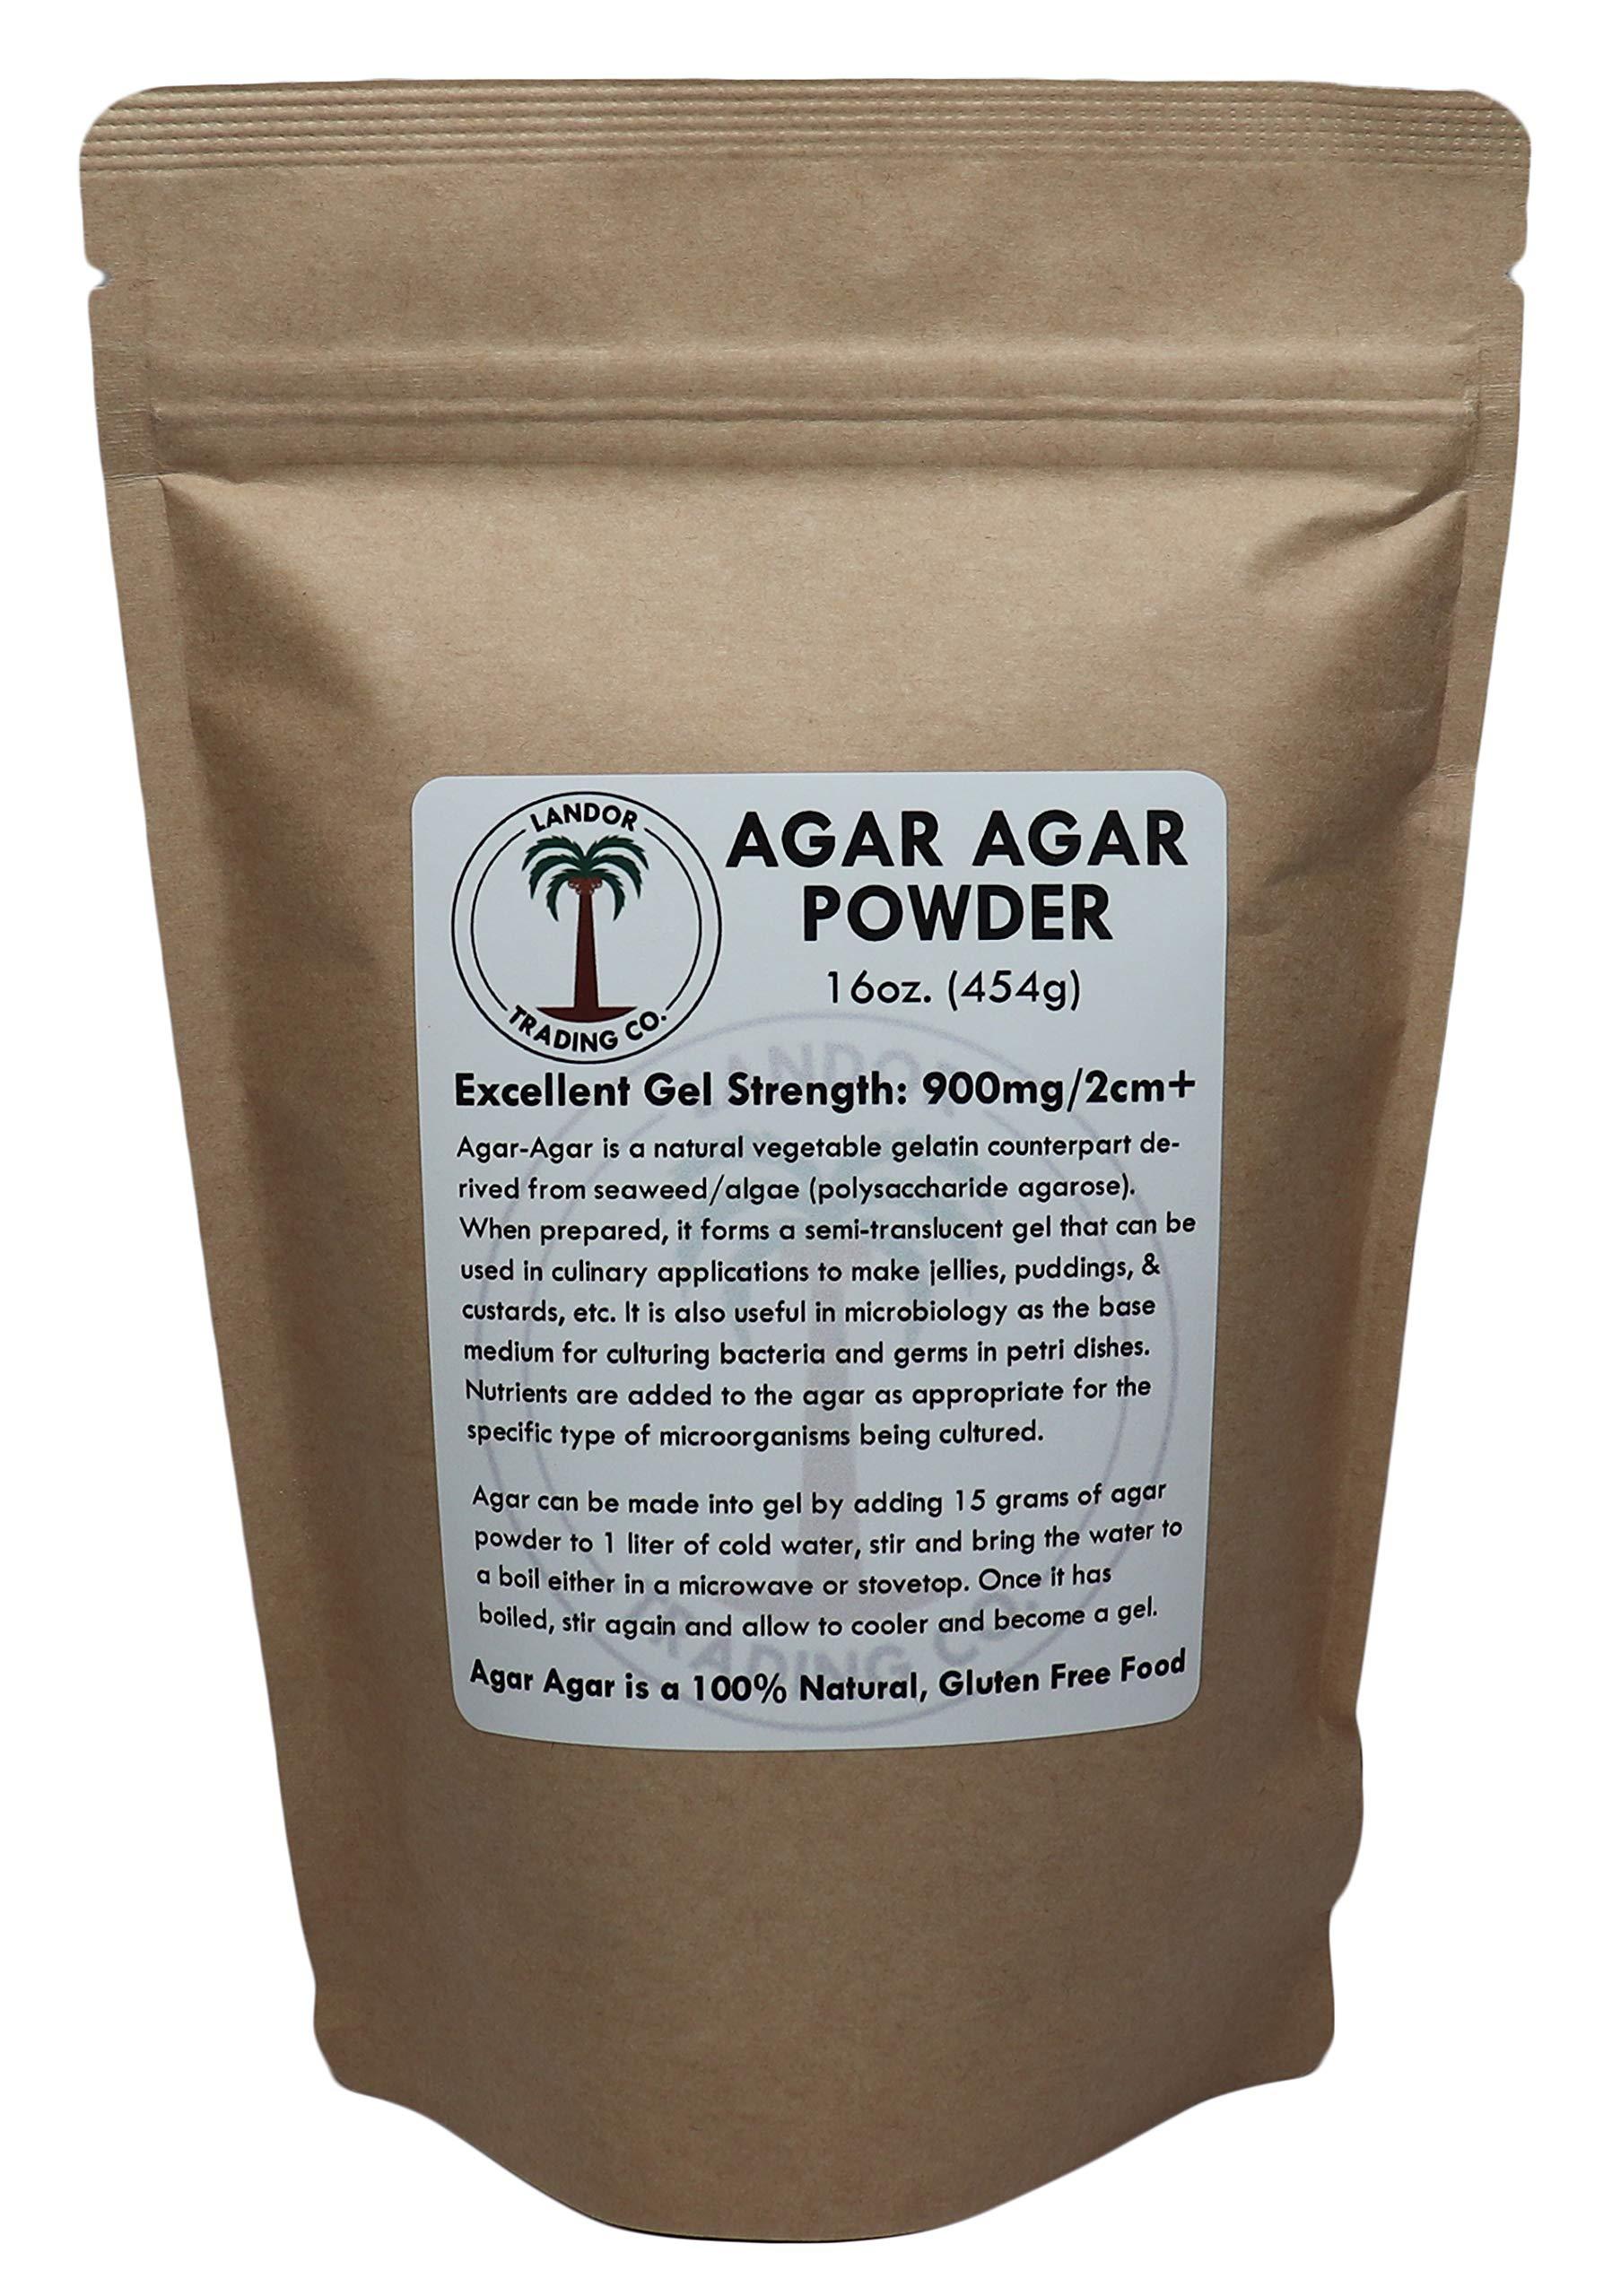 Agar Agar Powder 1 Pound - Excellent Gel Strength